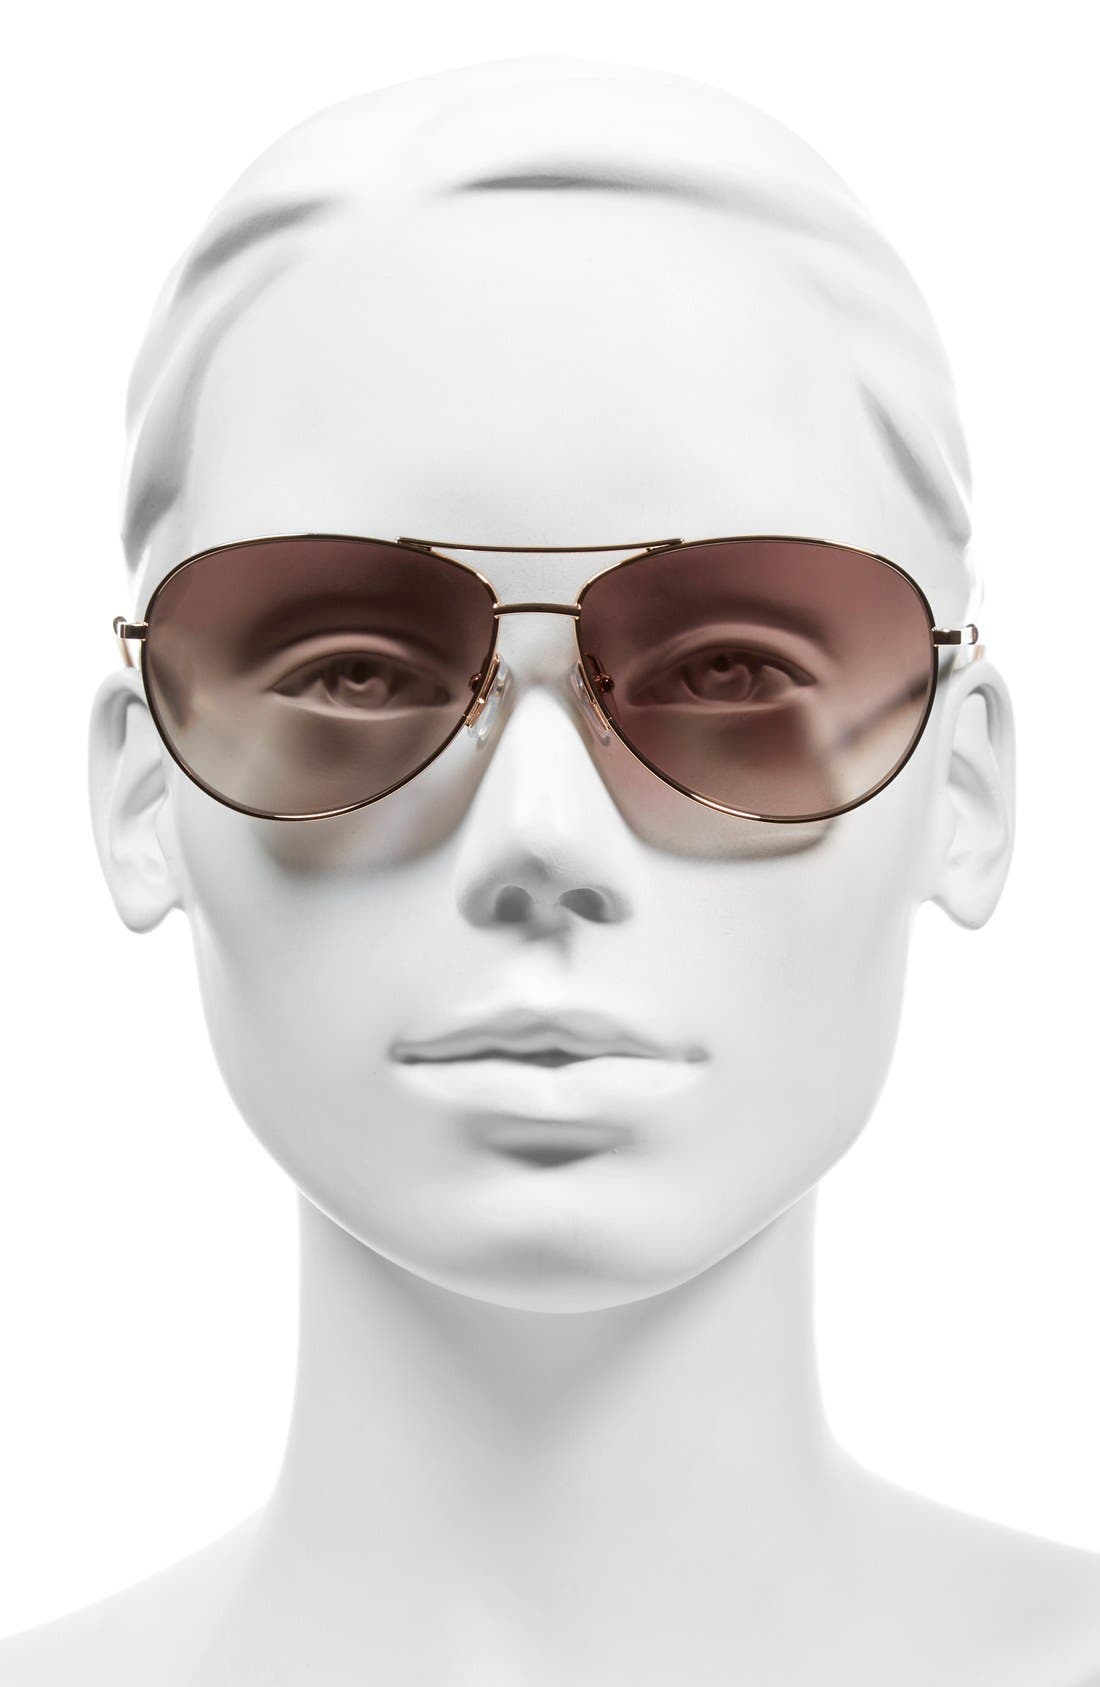 59mm Aviator Sunglasses,                             Alternate thumbnail 2, color,                             Gold Copper